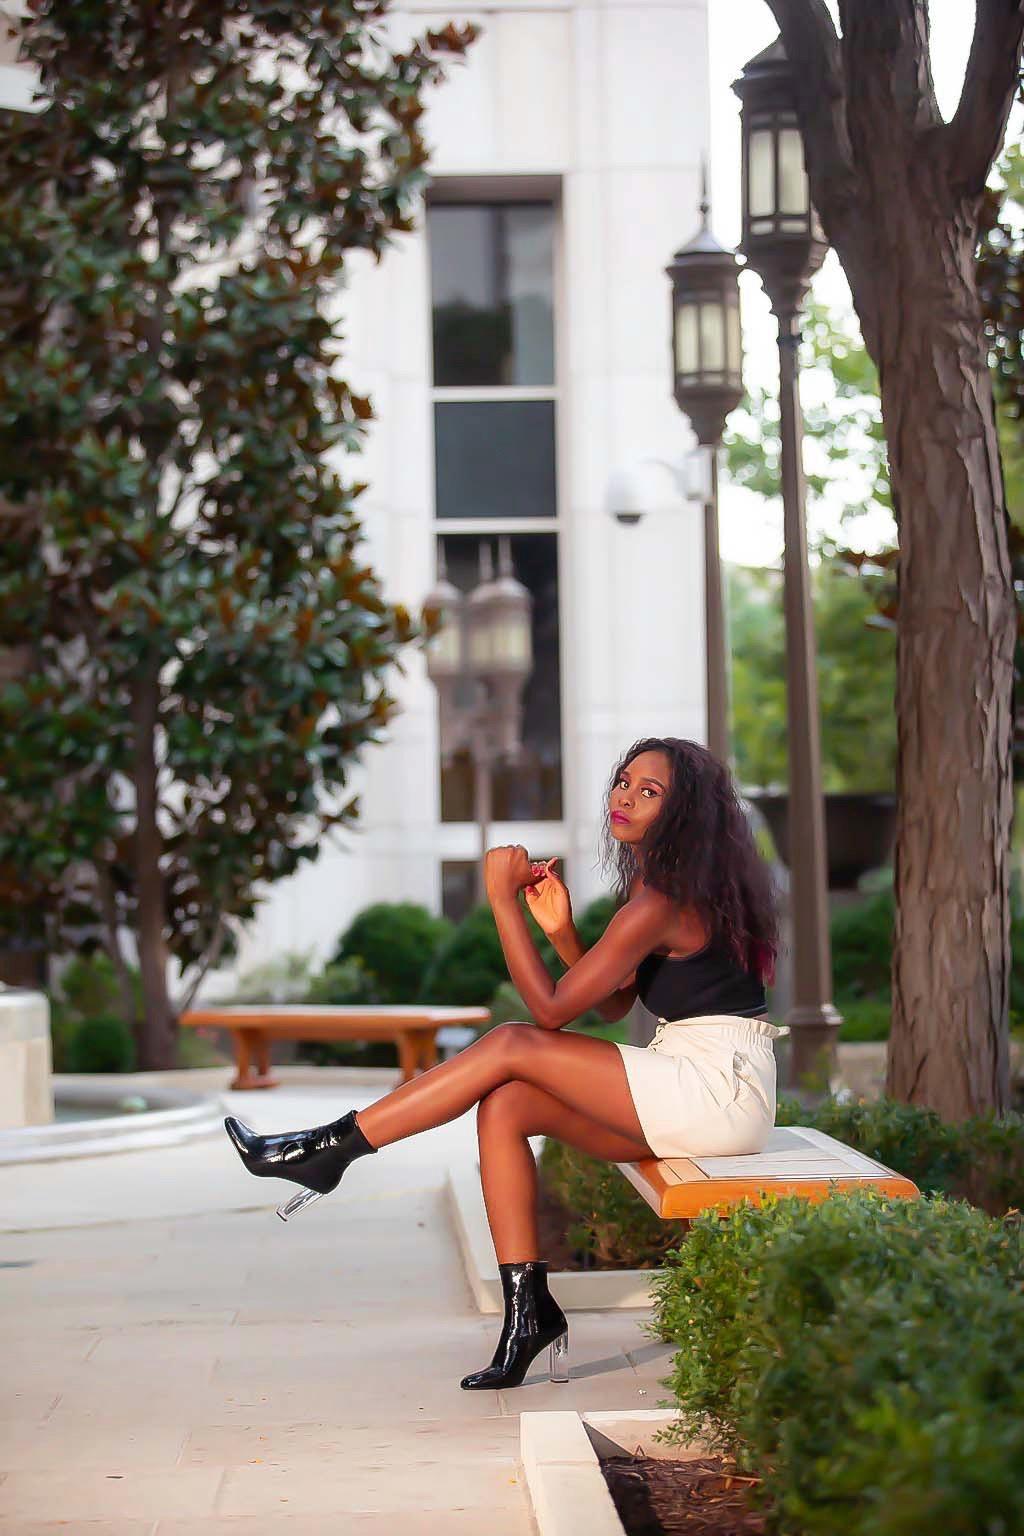 Model woman sitting